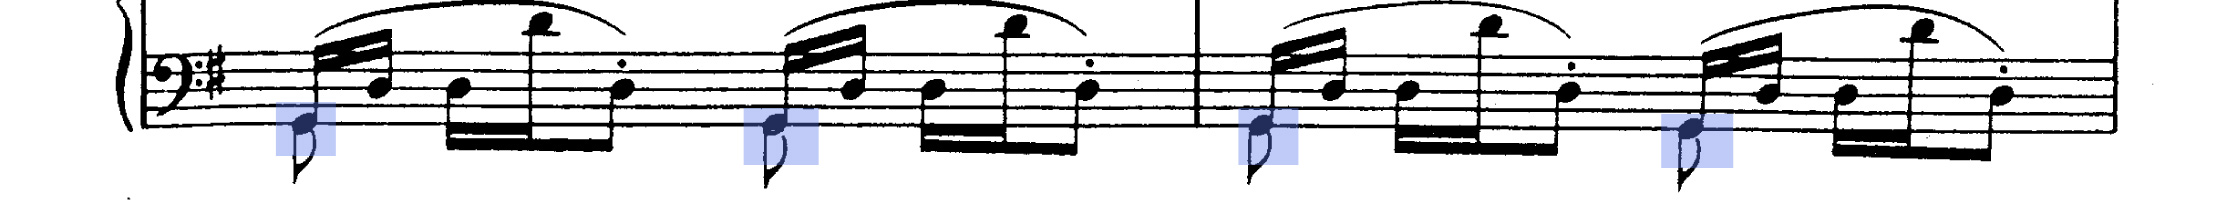 Cancion - ex.3